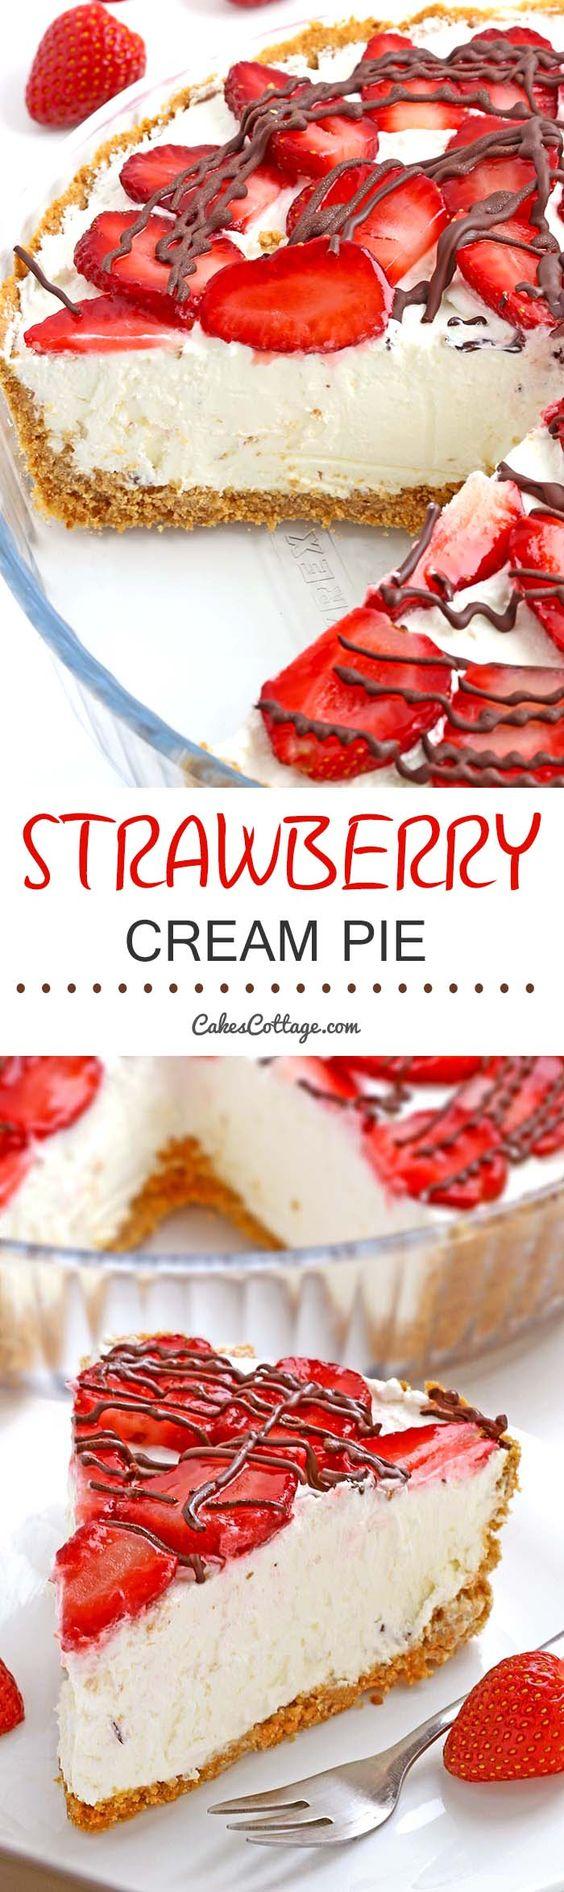 ... cream pie made with graham crackers, whipped cream, cream cheese and